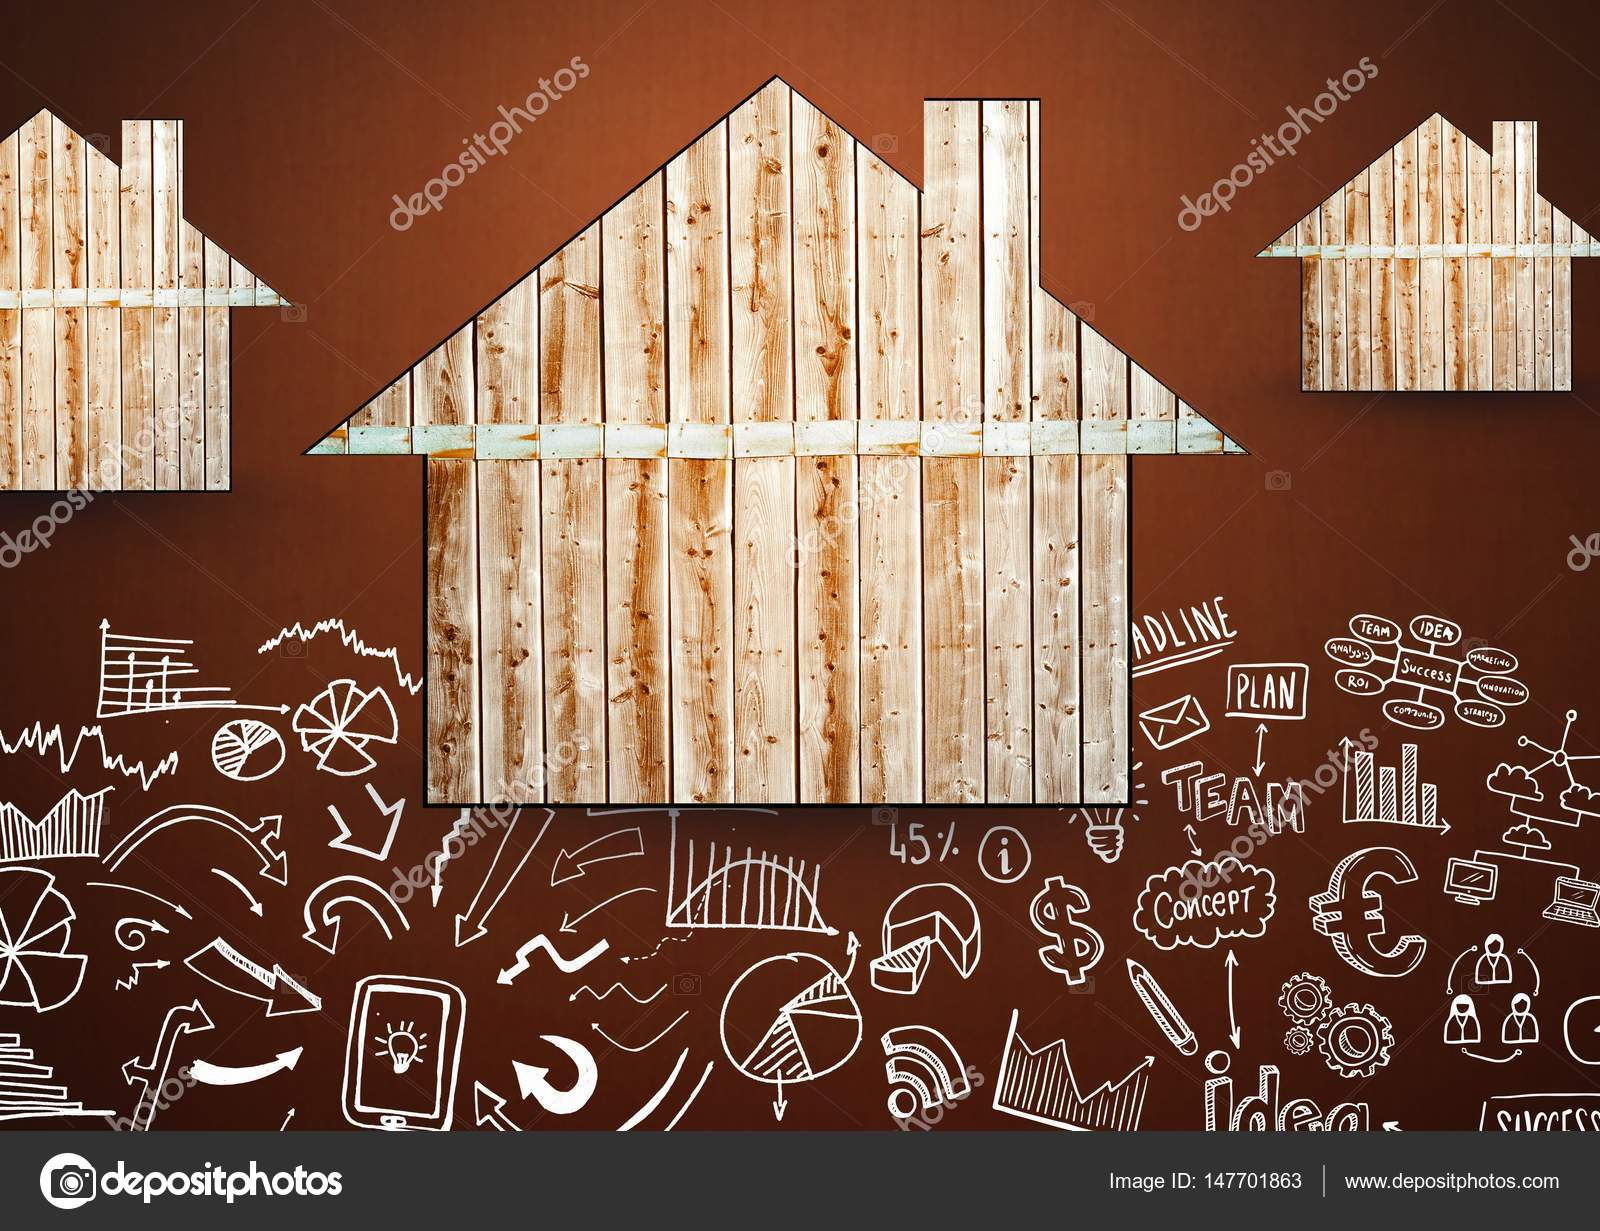 3efa6449445c Ξύλινα σπίτια καφέ φόντο με σχέδια σχέδια και διαγράμματα — Φωτογραφία  Αρχείου